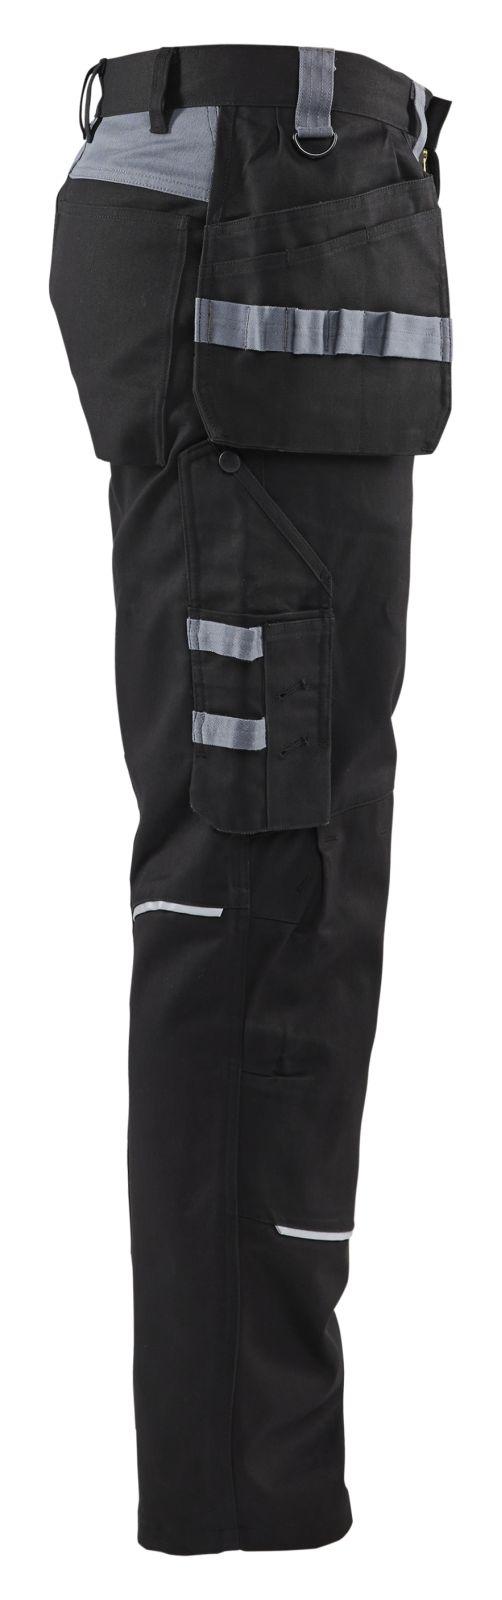 Blaklader Werkbroeken 14611516 Vlamvertragend zwart-grijs(9994)